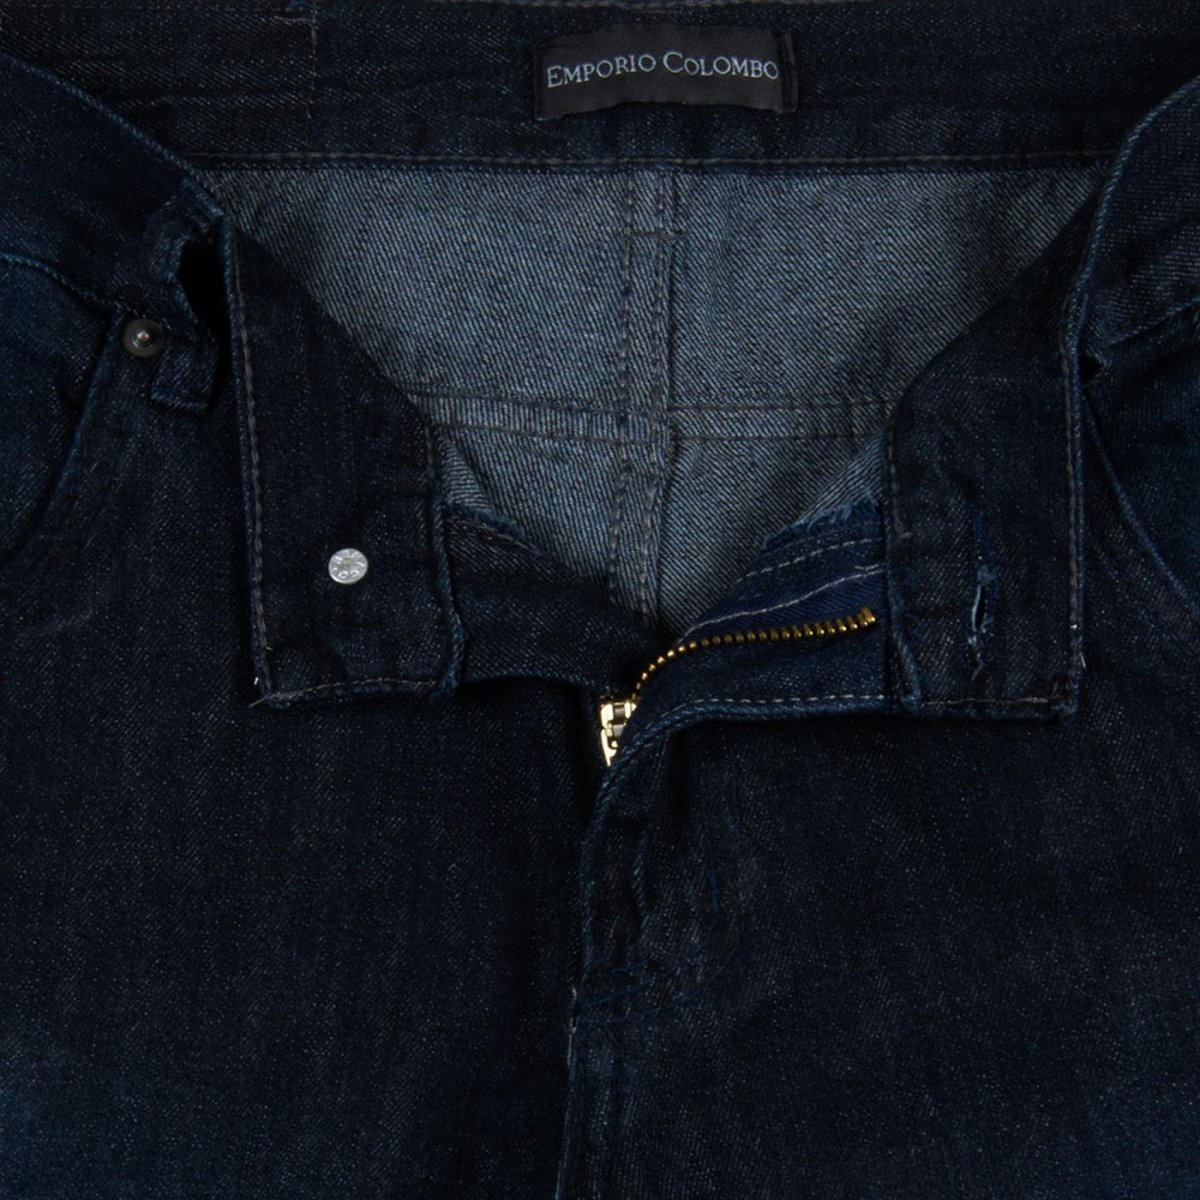 cb92701d7 Calça Jeans Masculina | Netshoes